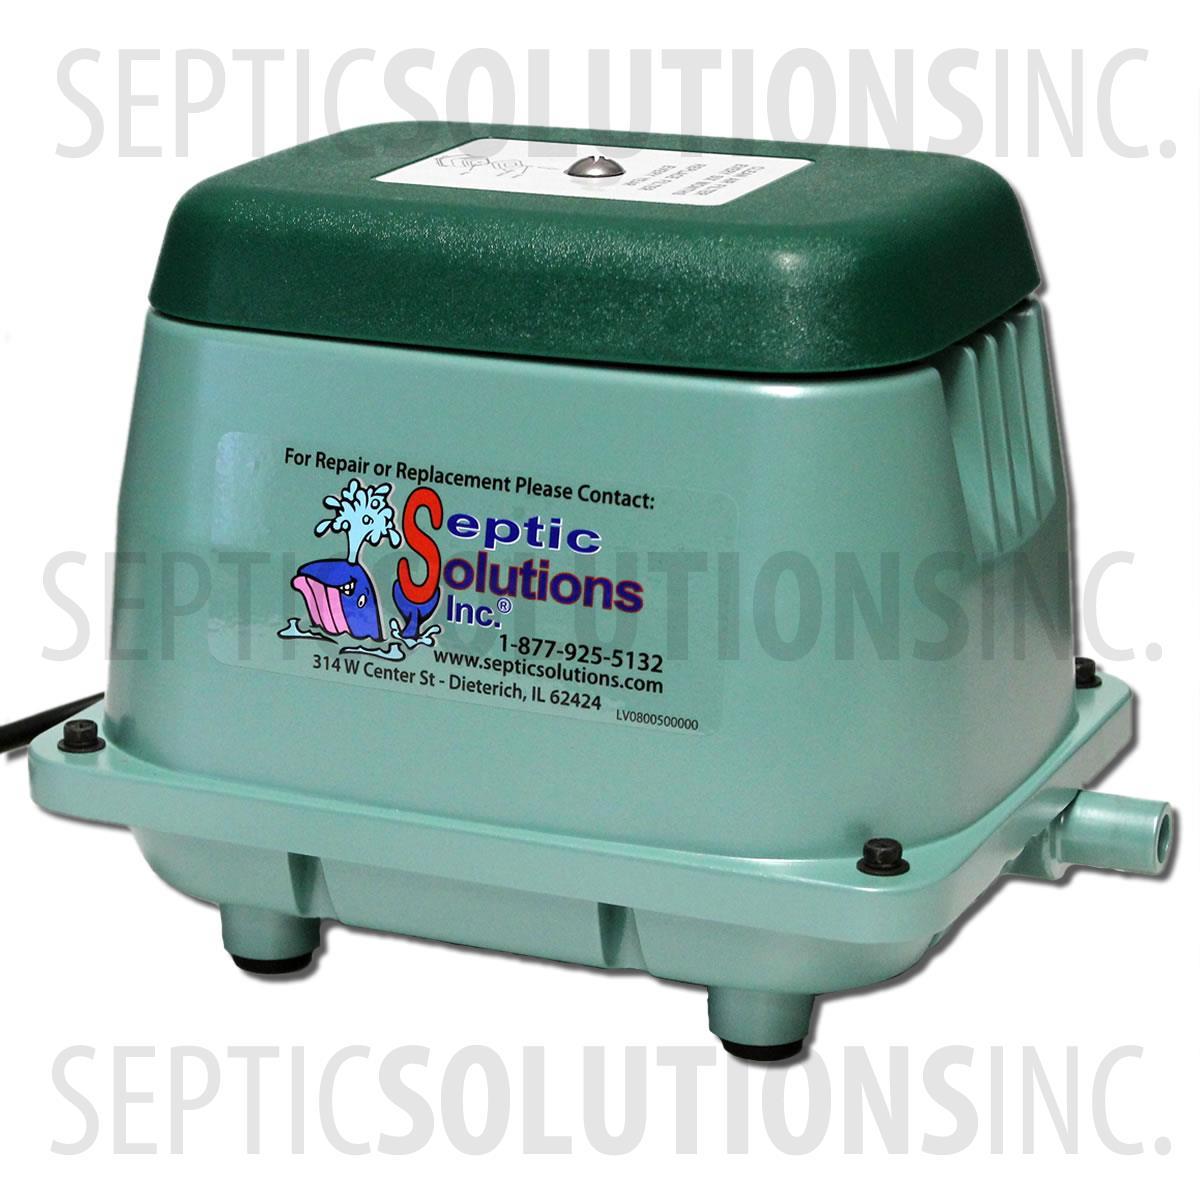 aqua aire aerobic septic system air pumps and repair parts rh septicsolutions com Wiring a Homeline Service Panel Wiring a Homeline Service Panel